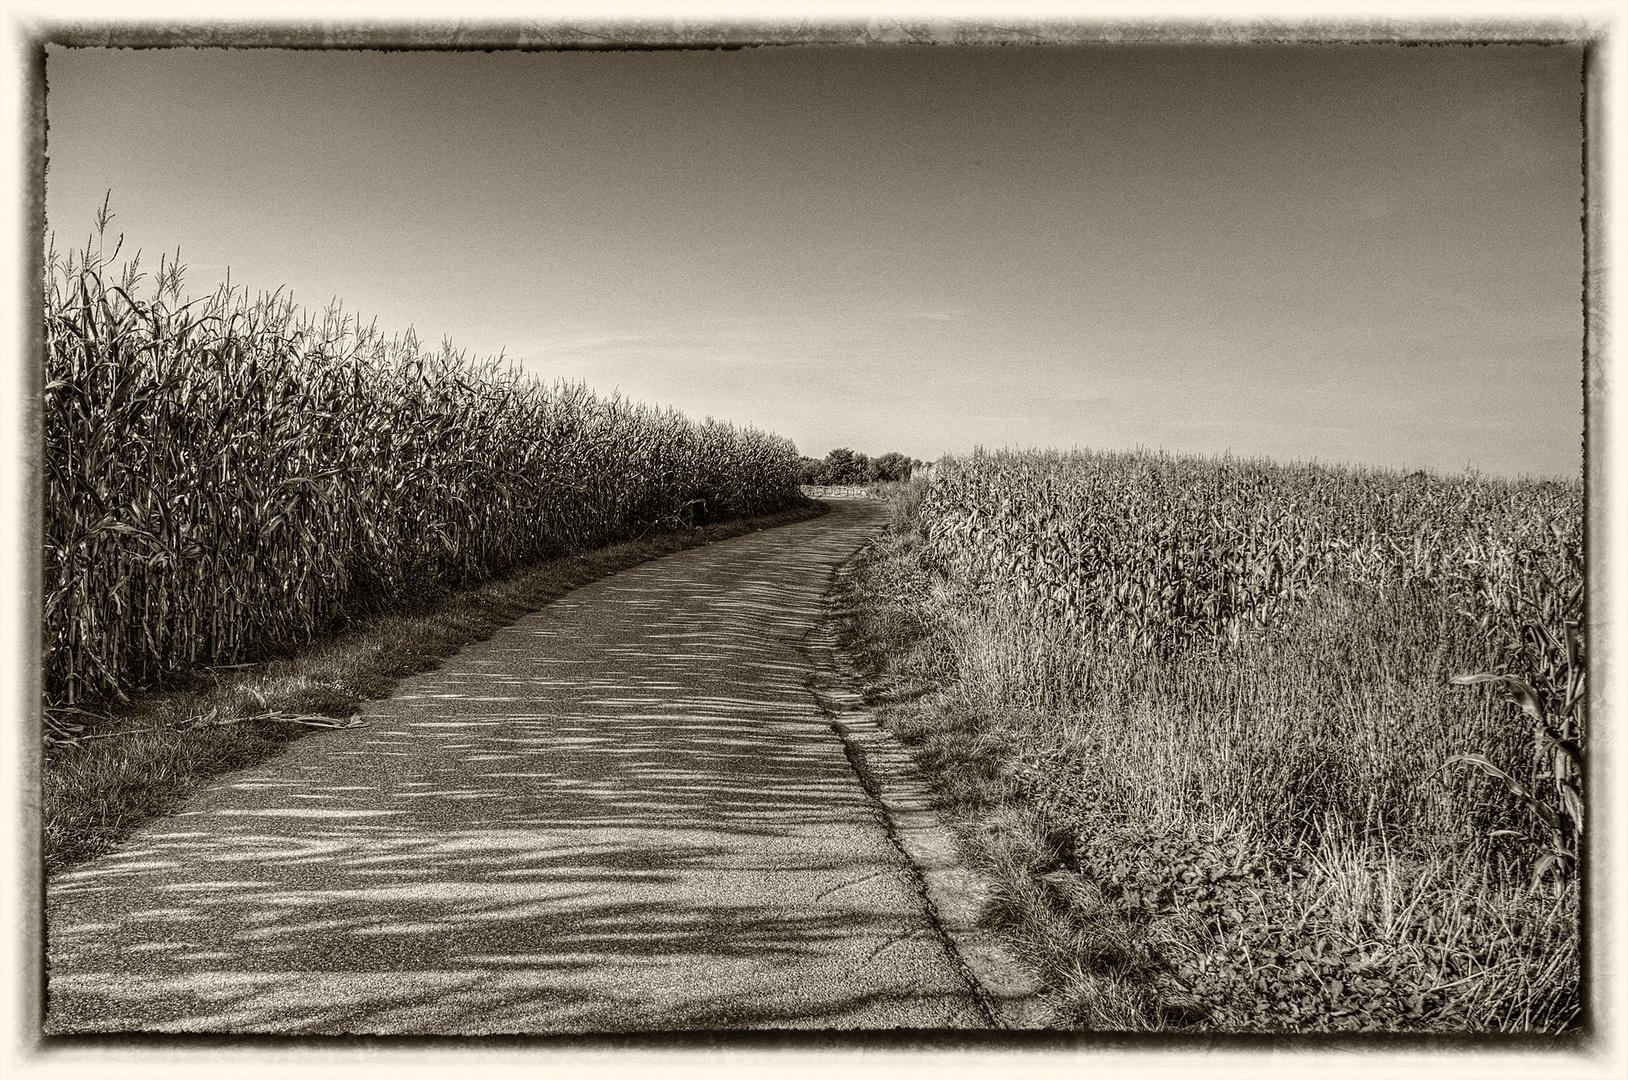 Maisfelder, aber anders